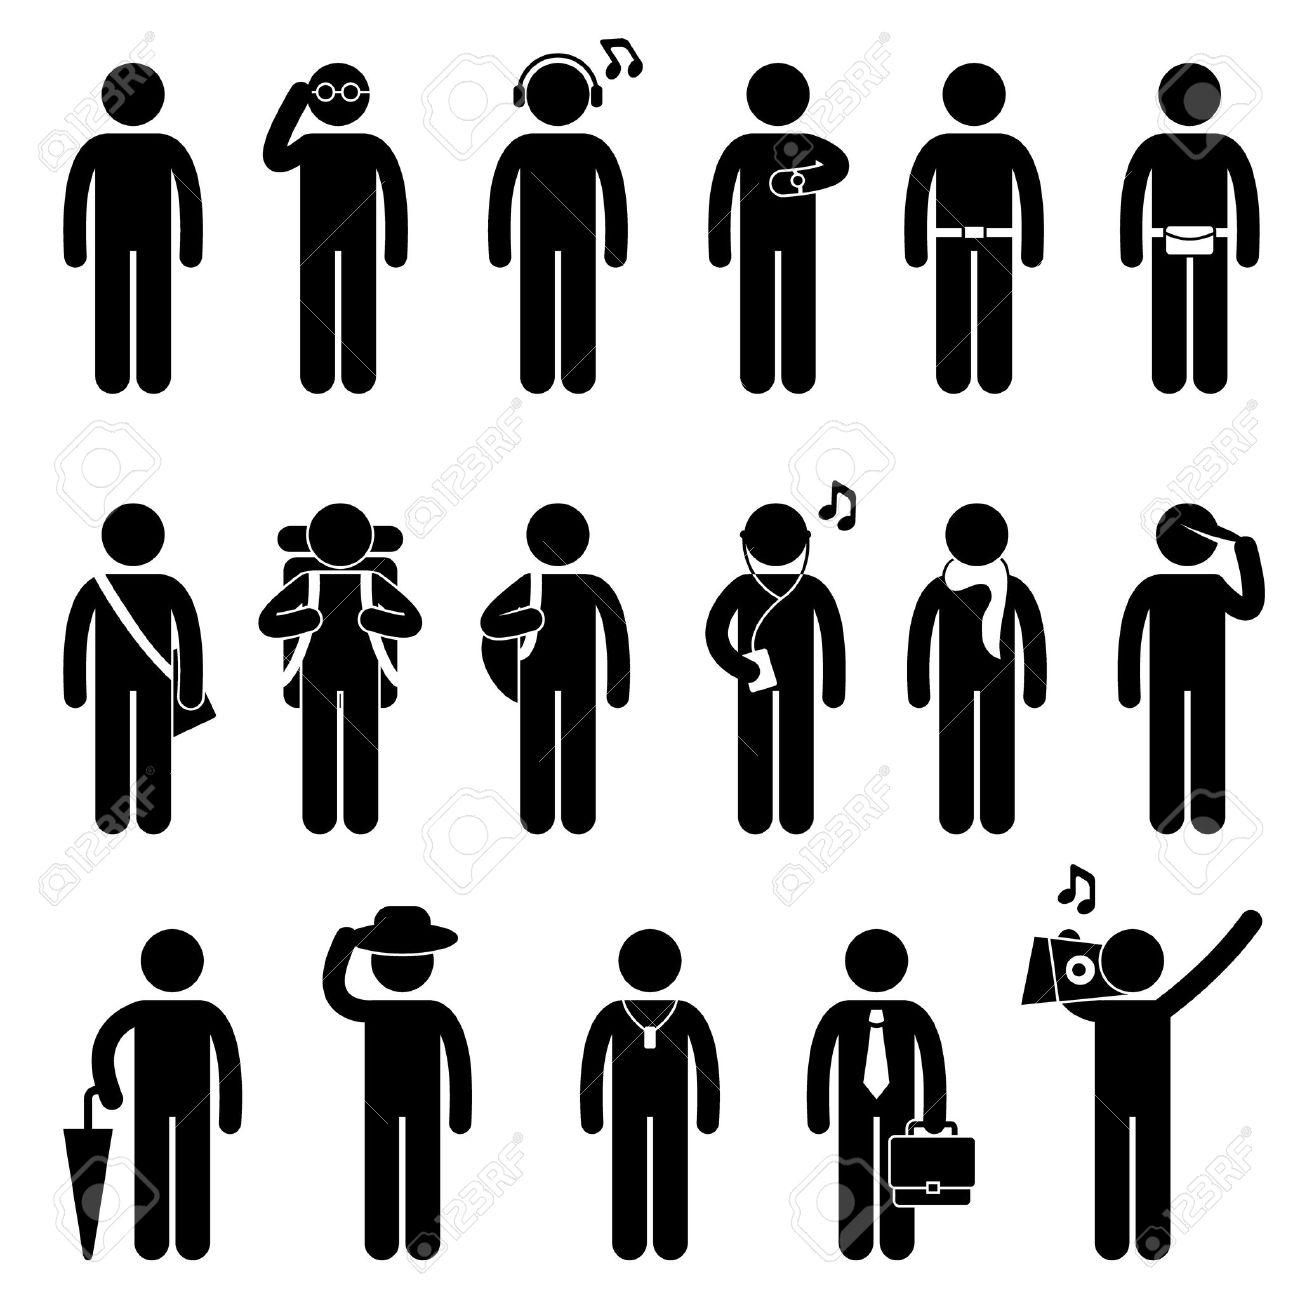 b152c4b99f4 People Man Male Fashion Wear Body Accessories Icon Symbol Sign Pictogram Stock  Vector - 14446304